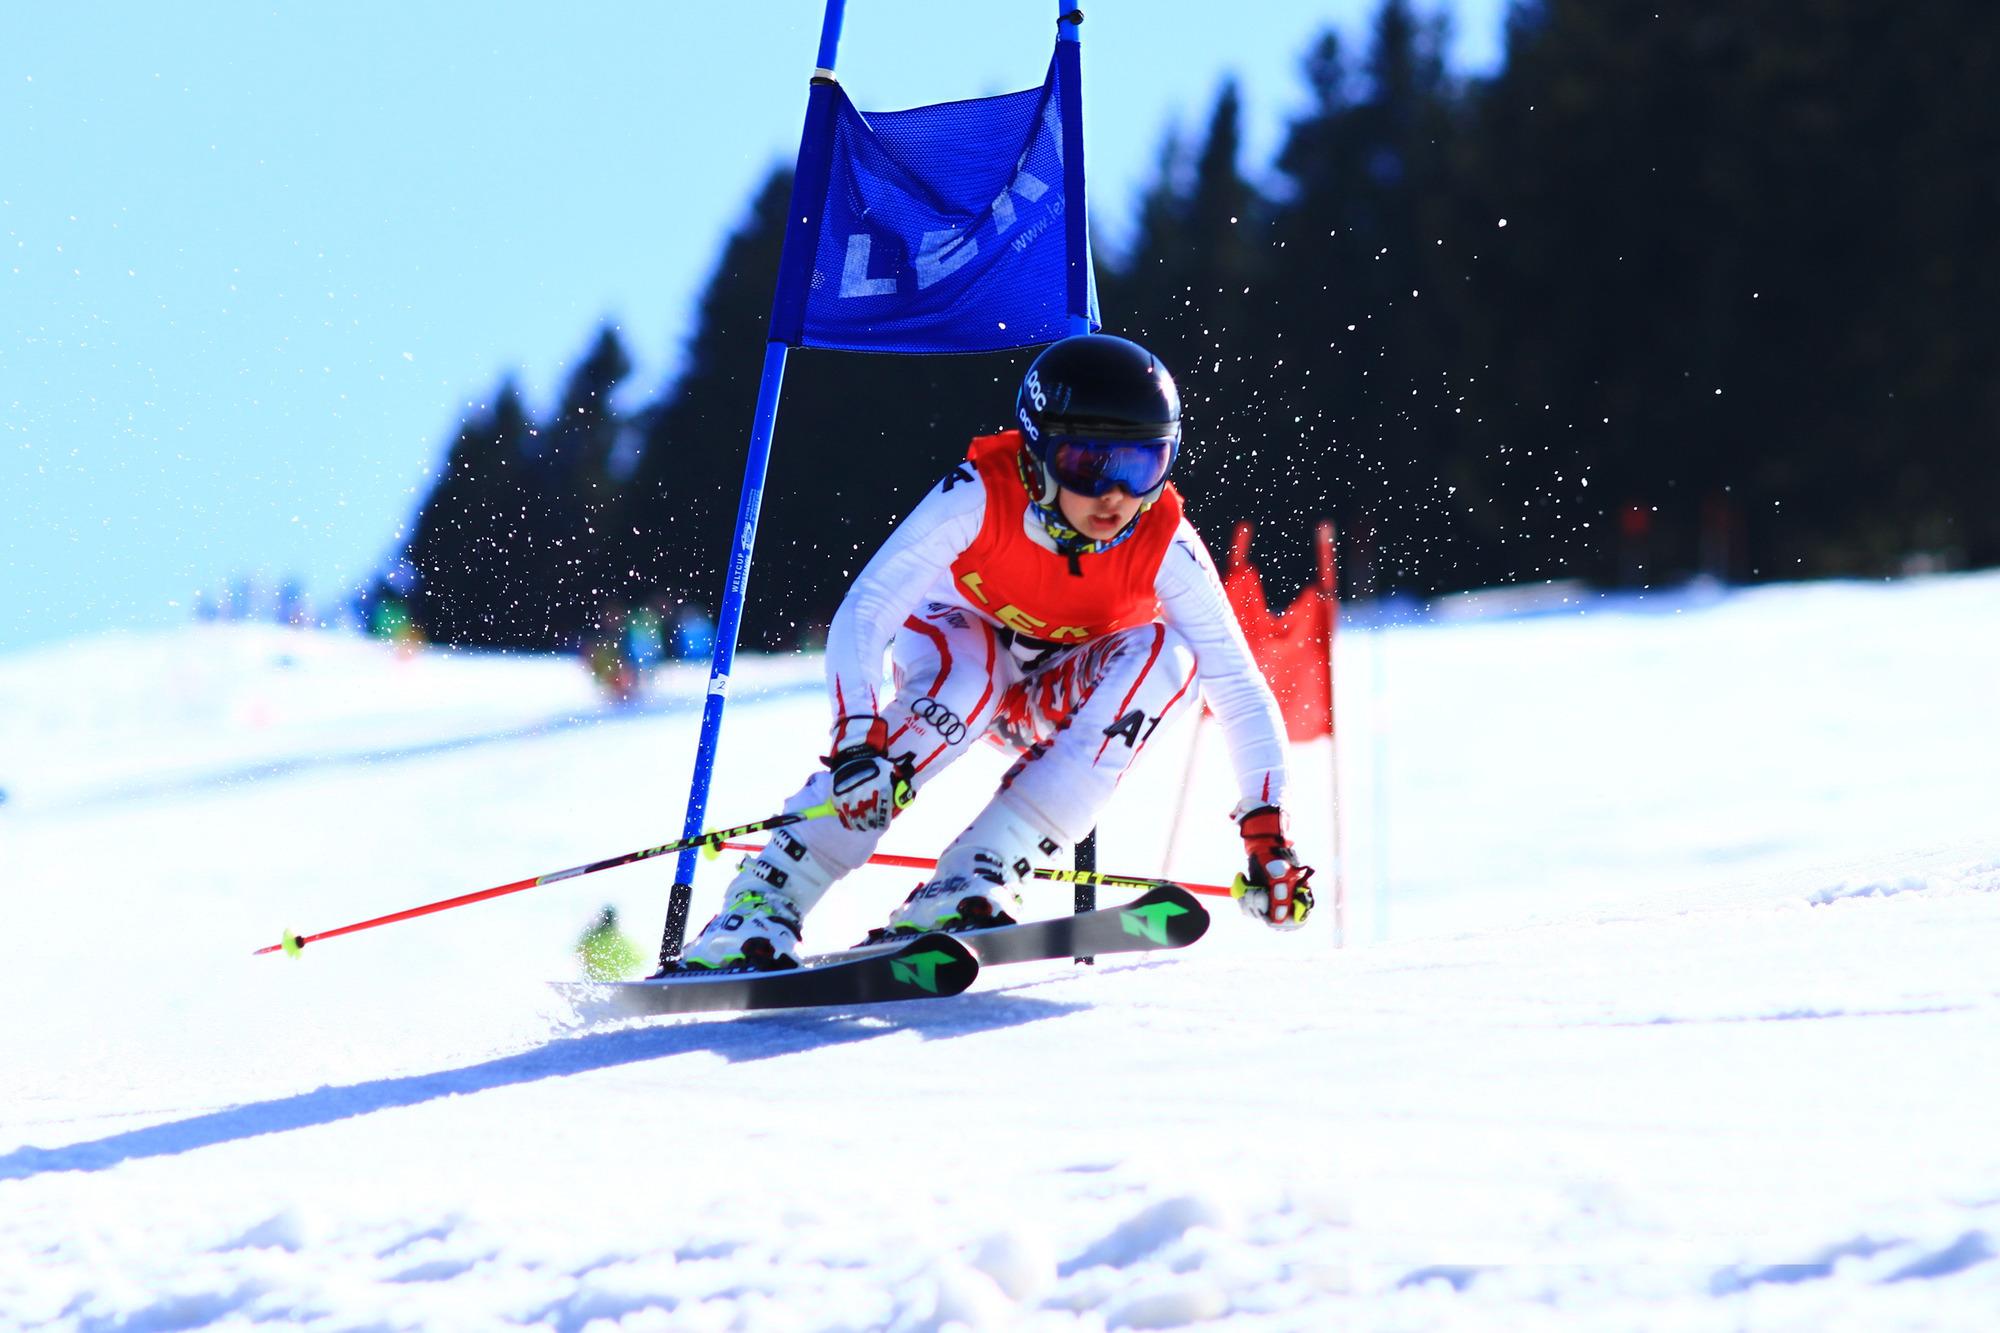 Wintersportler